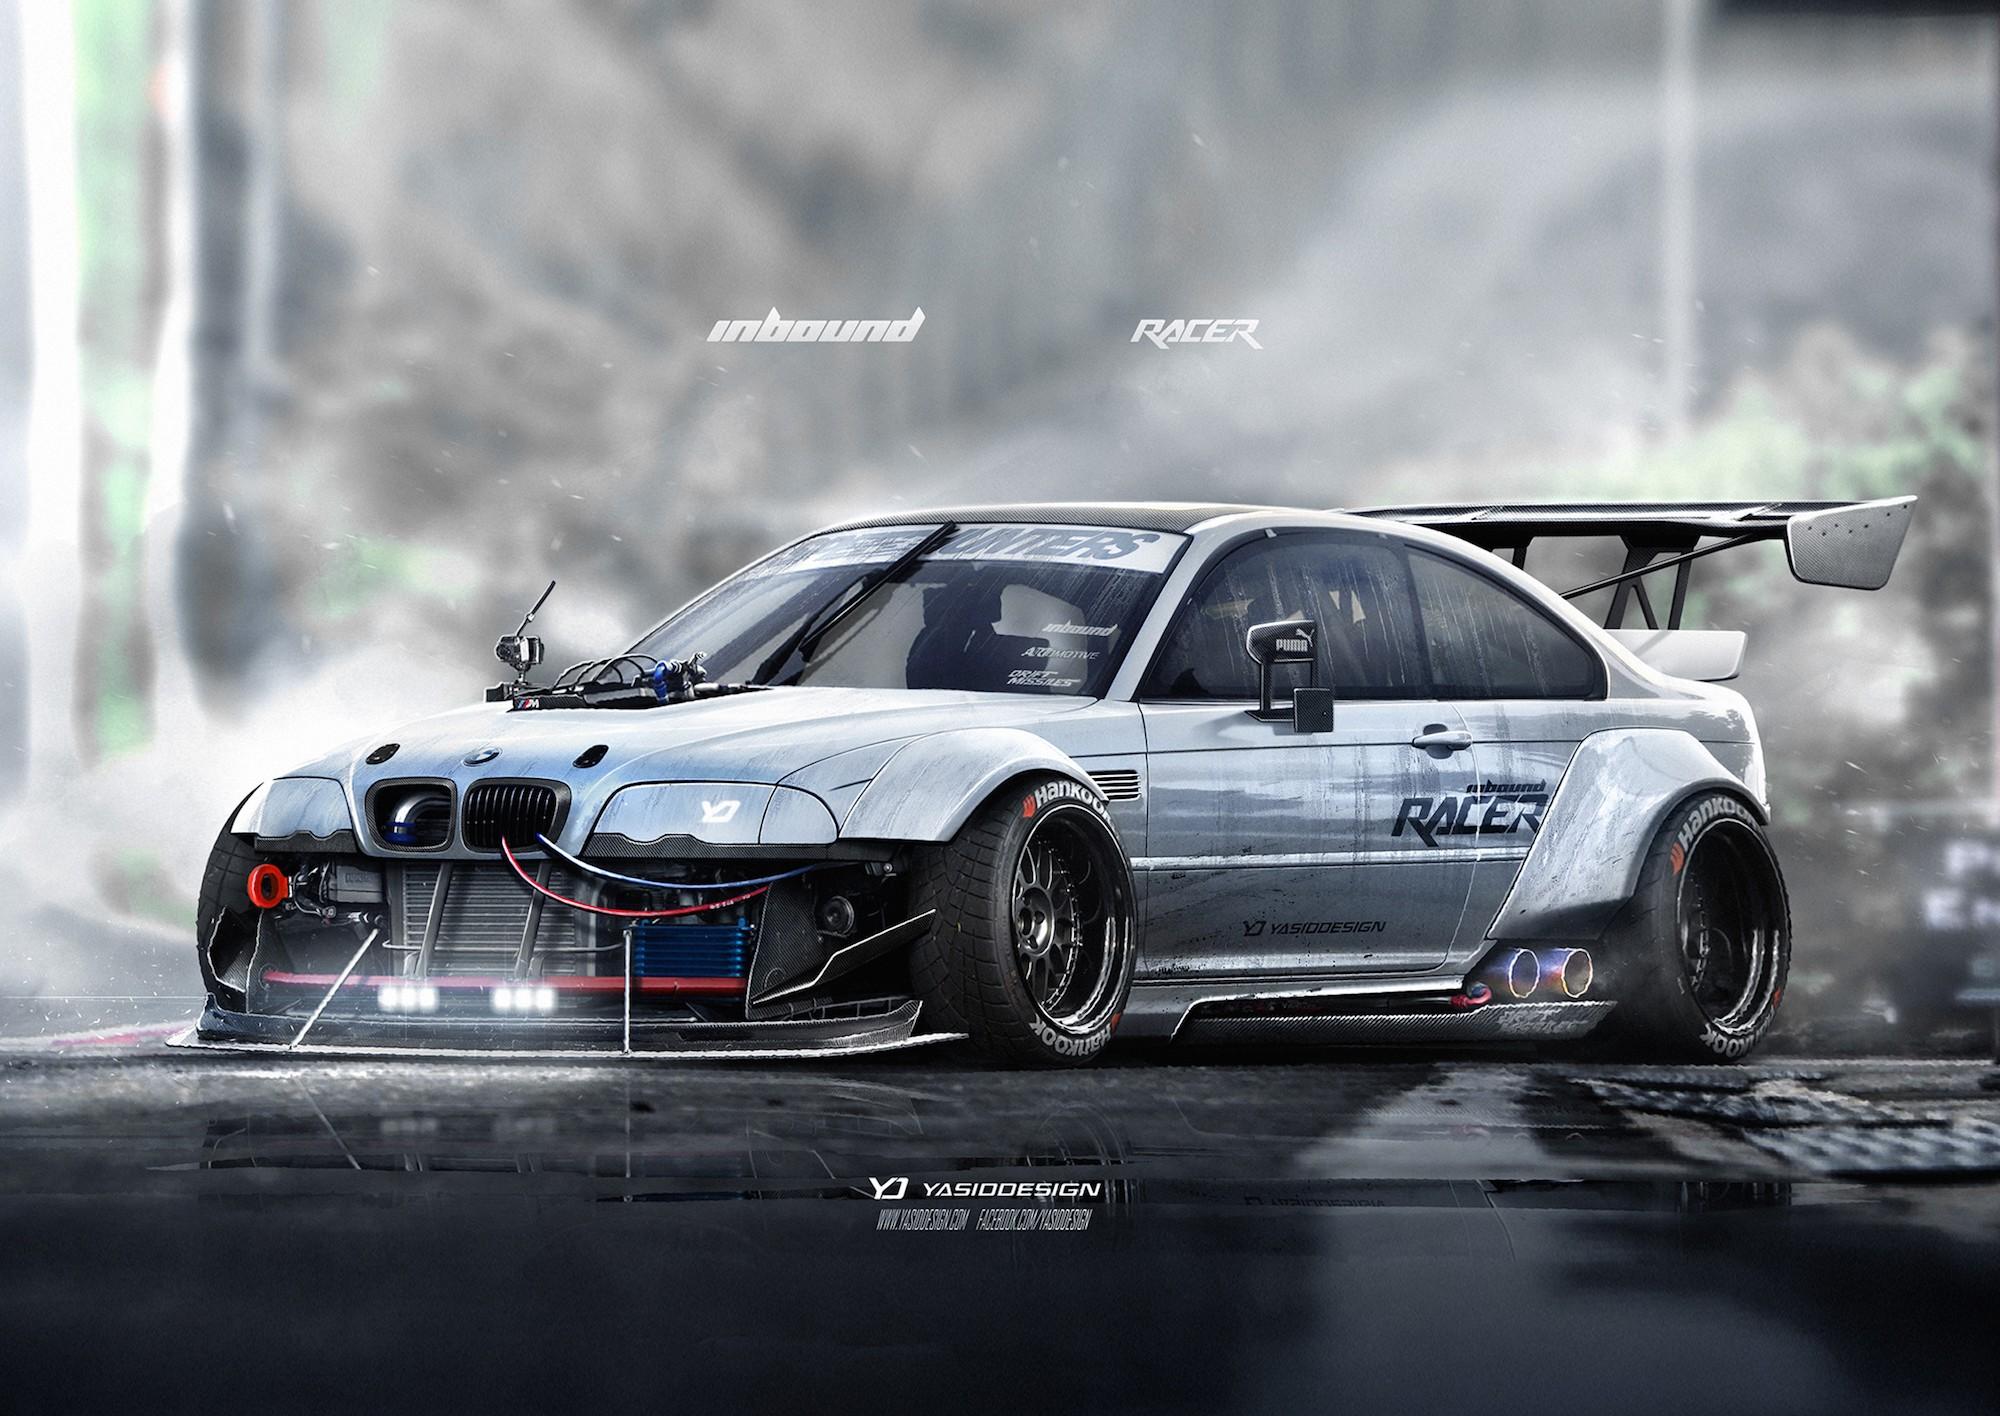 Wallpaper Race Cars Render Artwork Drifting Sports Car Bmw M3